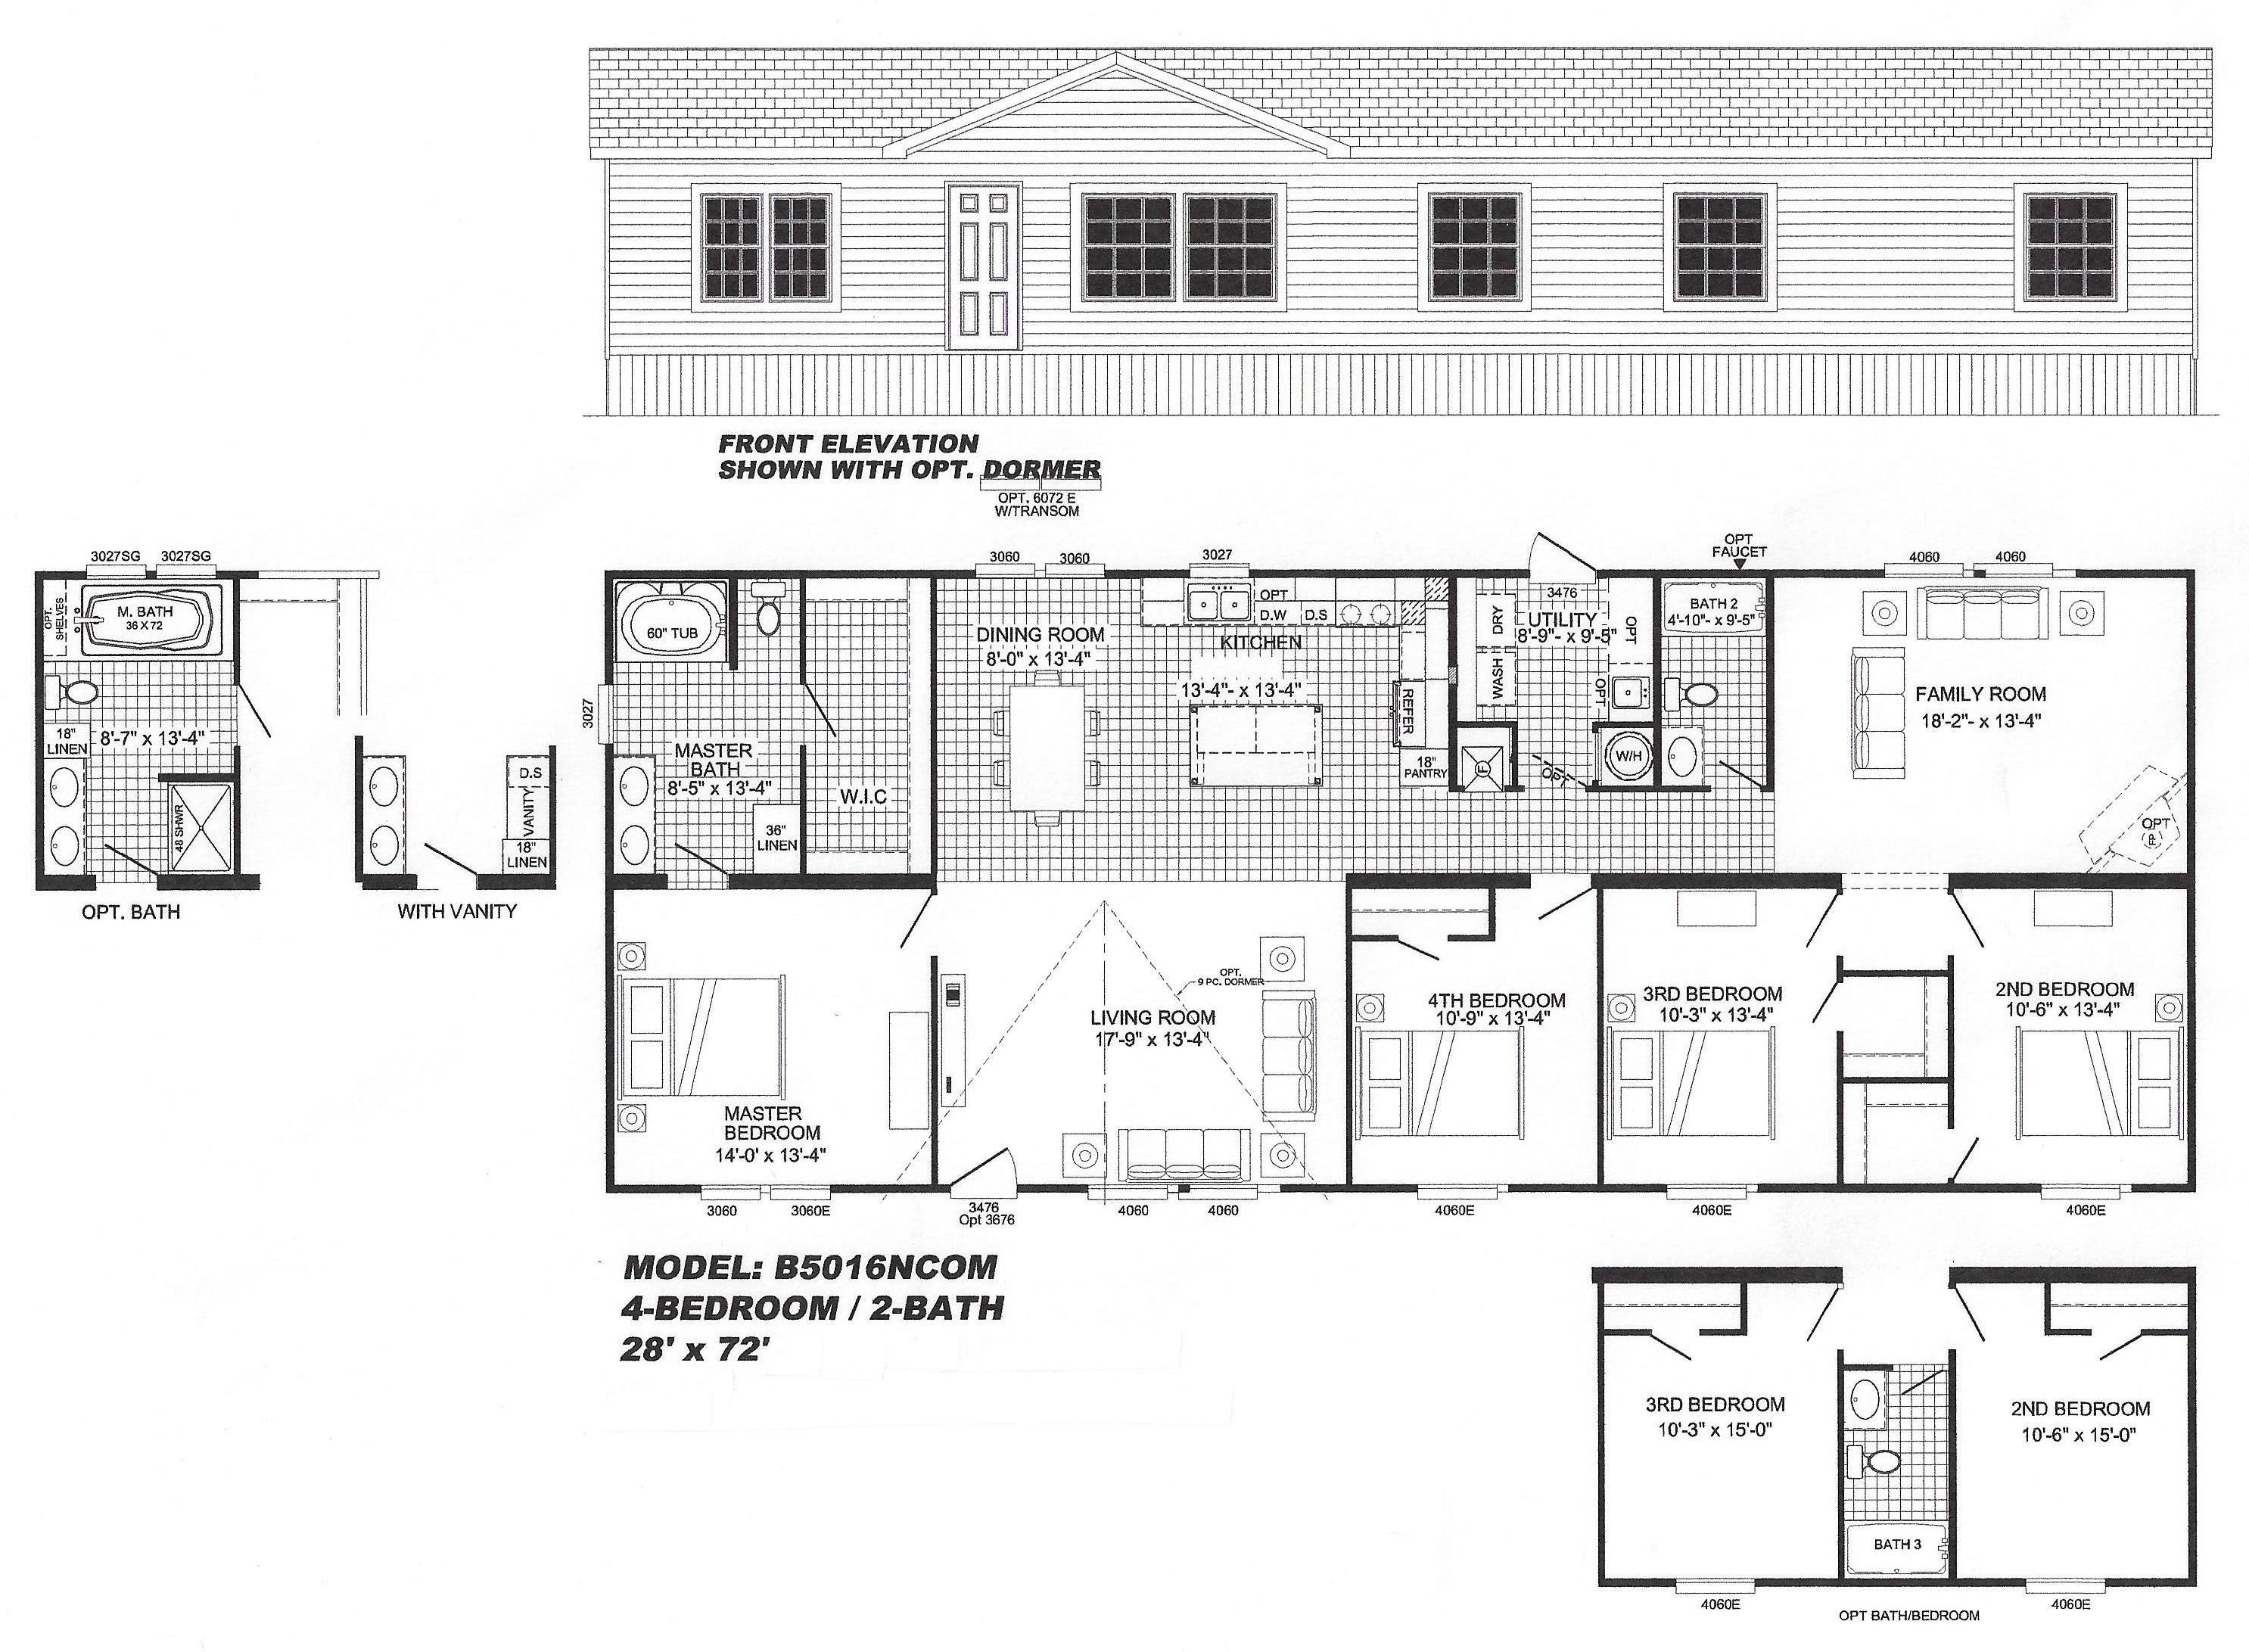 4 bedroom floor plan b 5016 hawks homes manufactured for 4 bedroom mobile home floor plans